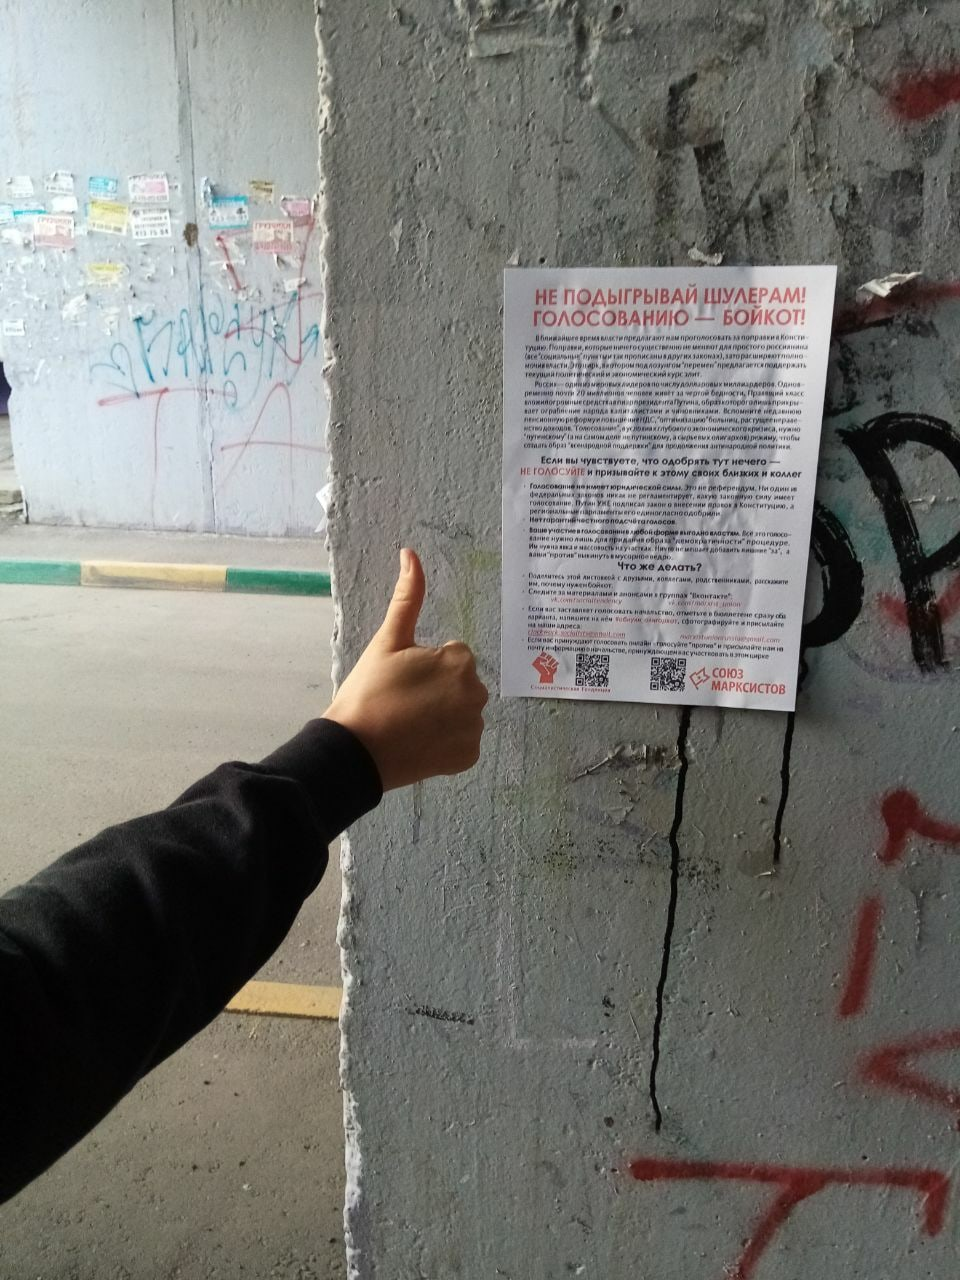 socialist-tendency-rusia-calle.jpg